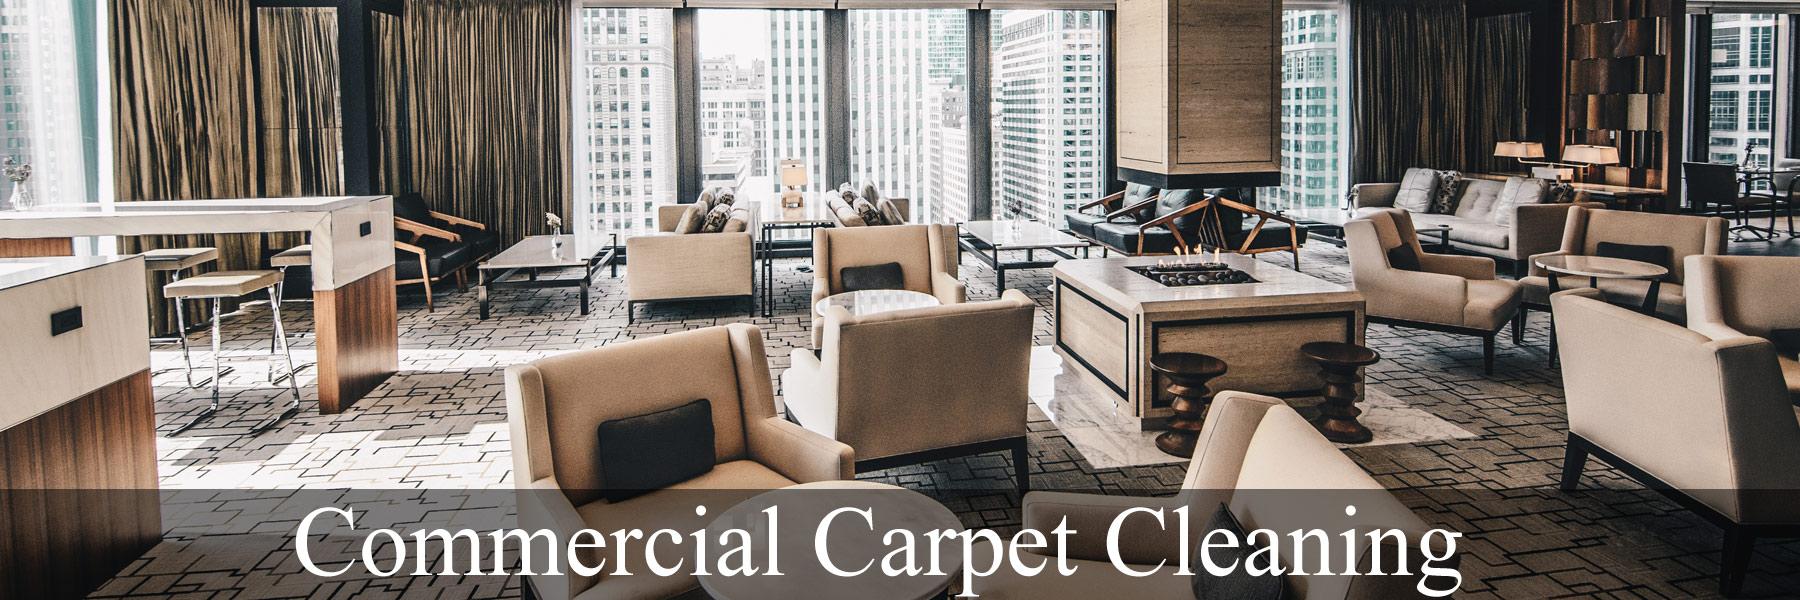 Commercial-Carpet-Cleaning_slider